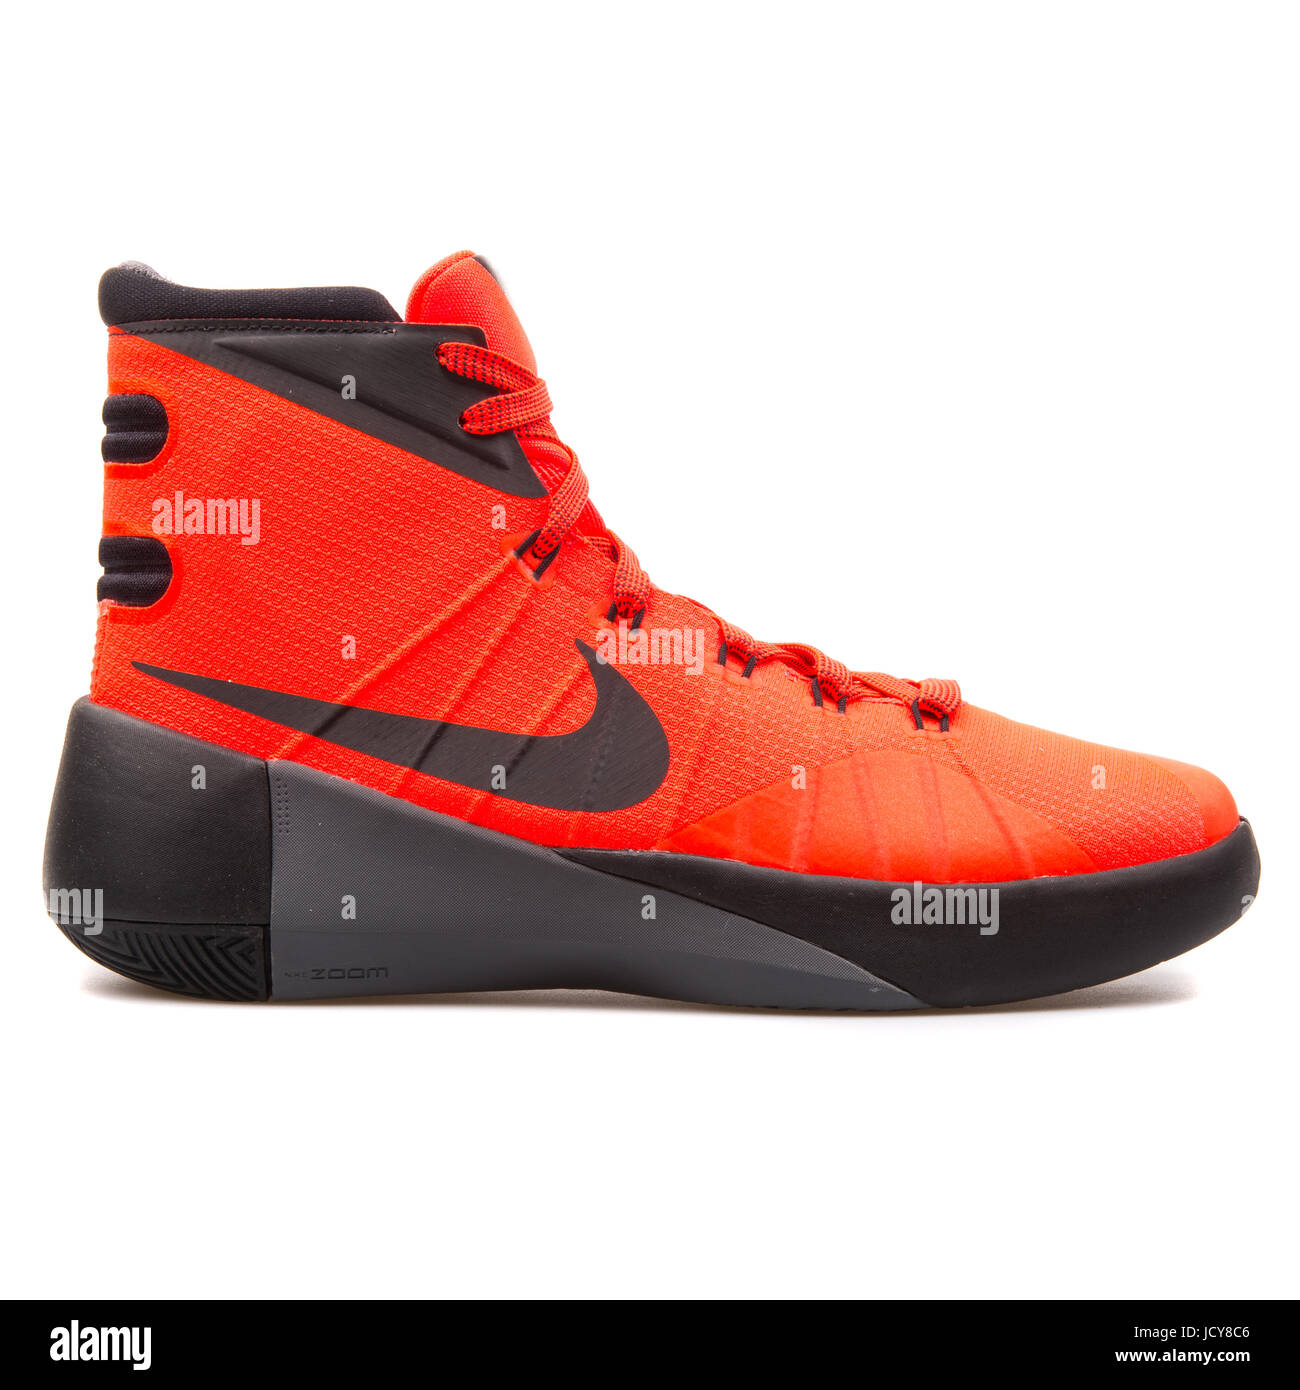 86dd04cbc134 Nike Shoes 2015 White Stock Photos   Nike Shoes 2015 White Stock ...